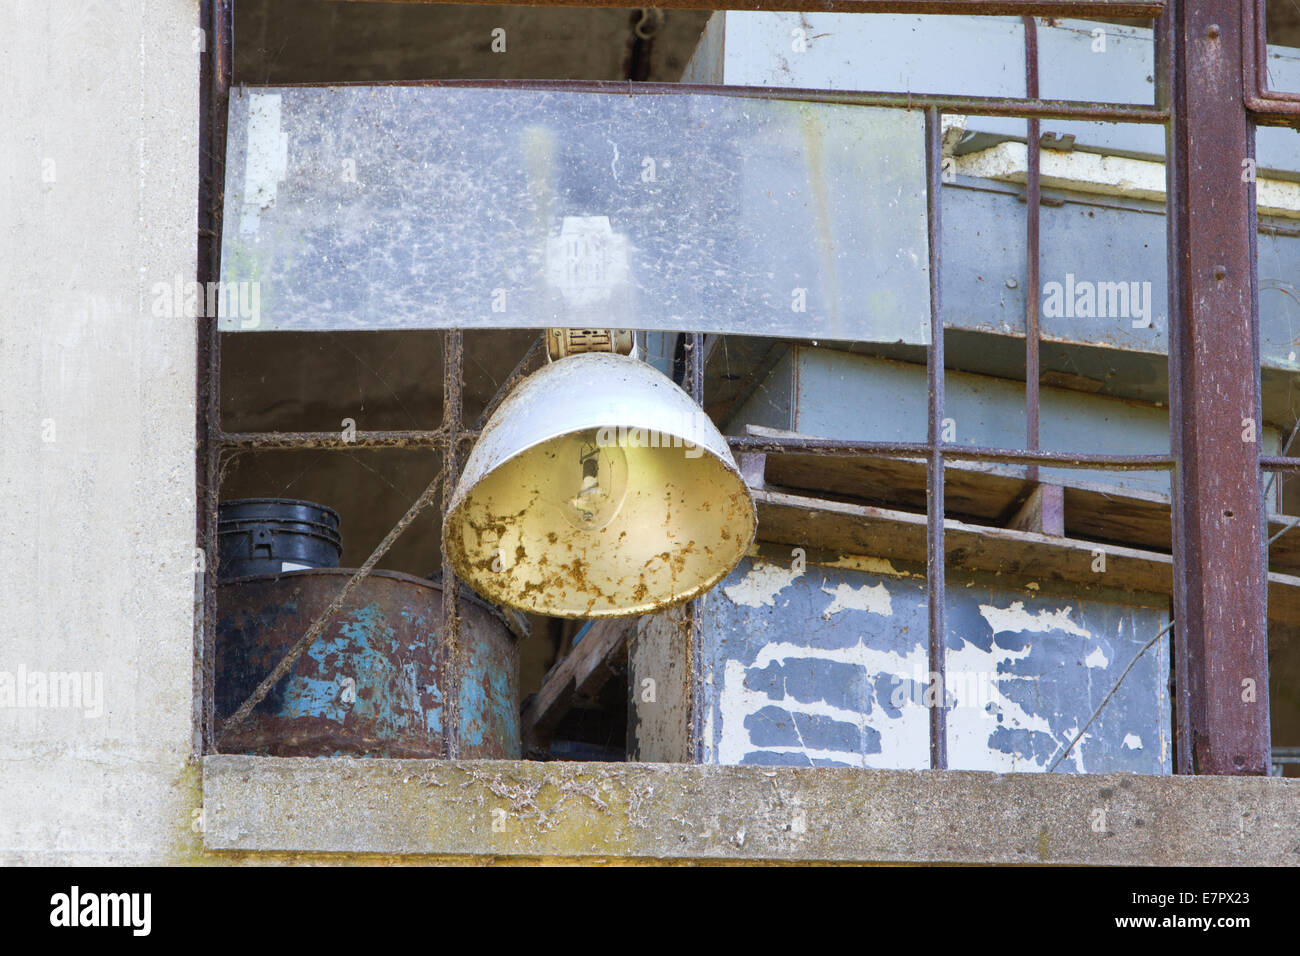 Streetlight against a decrepit building (Peters Cartridge Factory near Mils, Ohio) - Stock Image